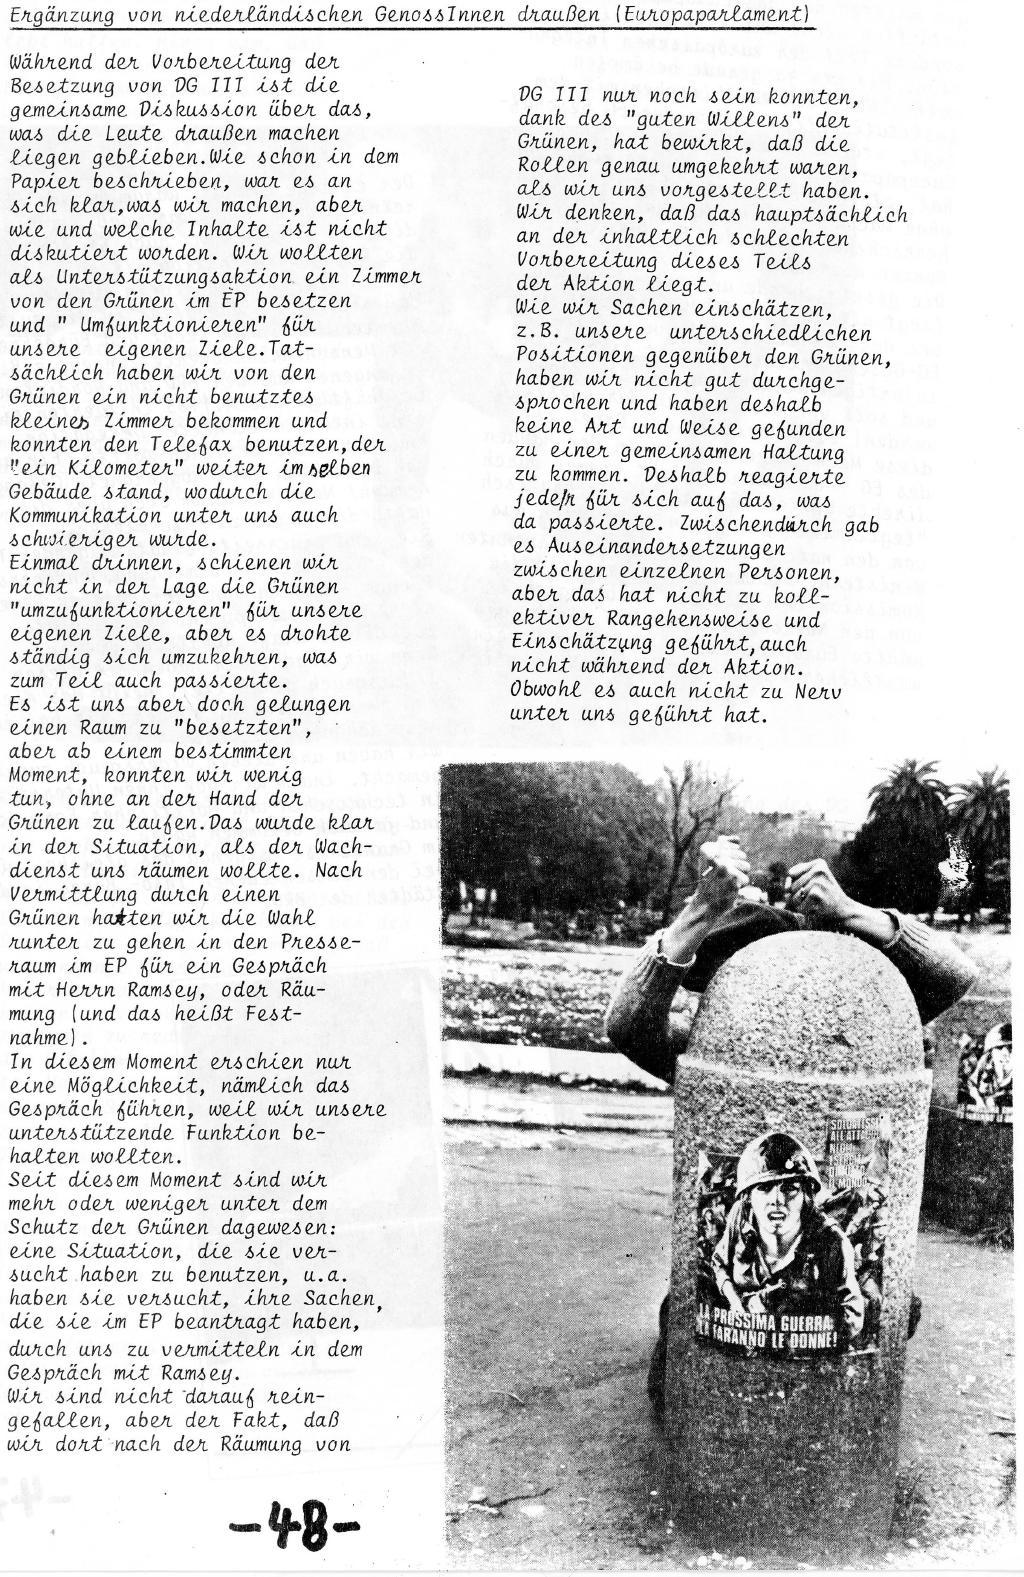 Belgien_Doku_Besetzung_EG_Kommission_1989_050